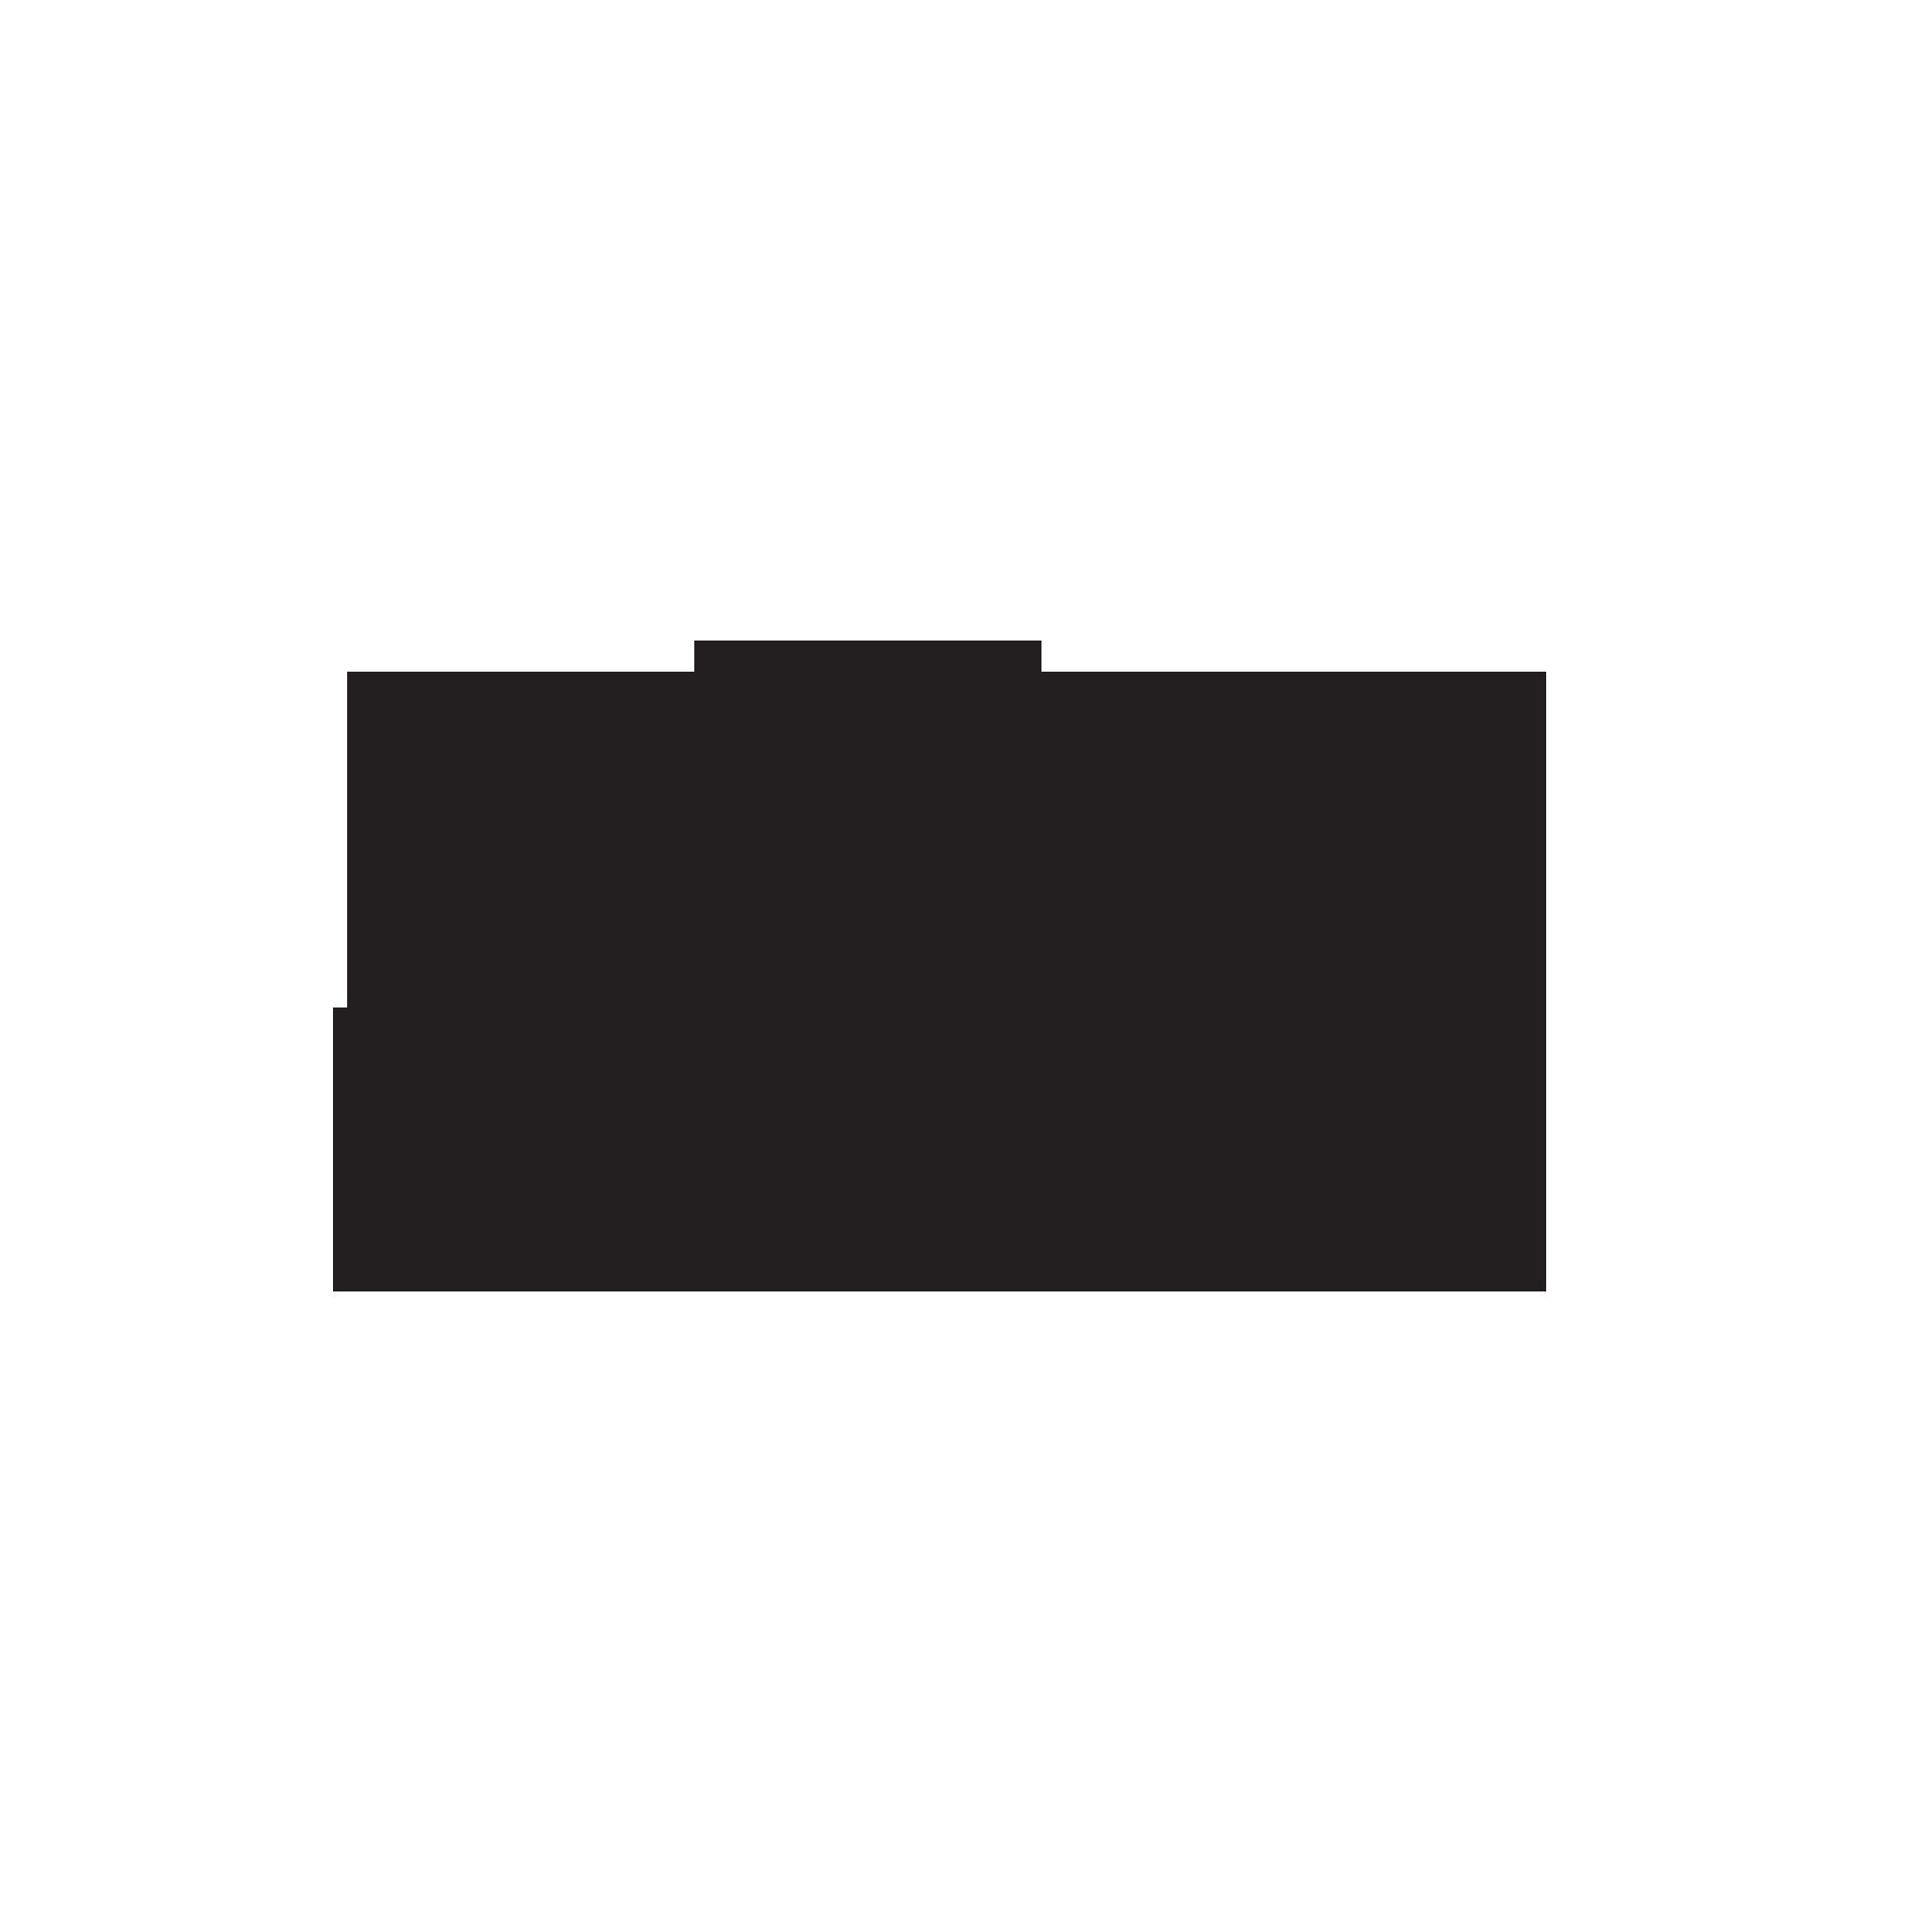 Jose Cuervo Tradicional - Logo.png